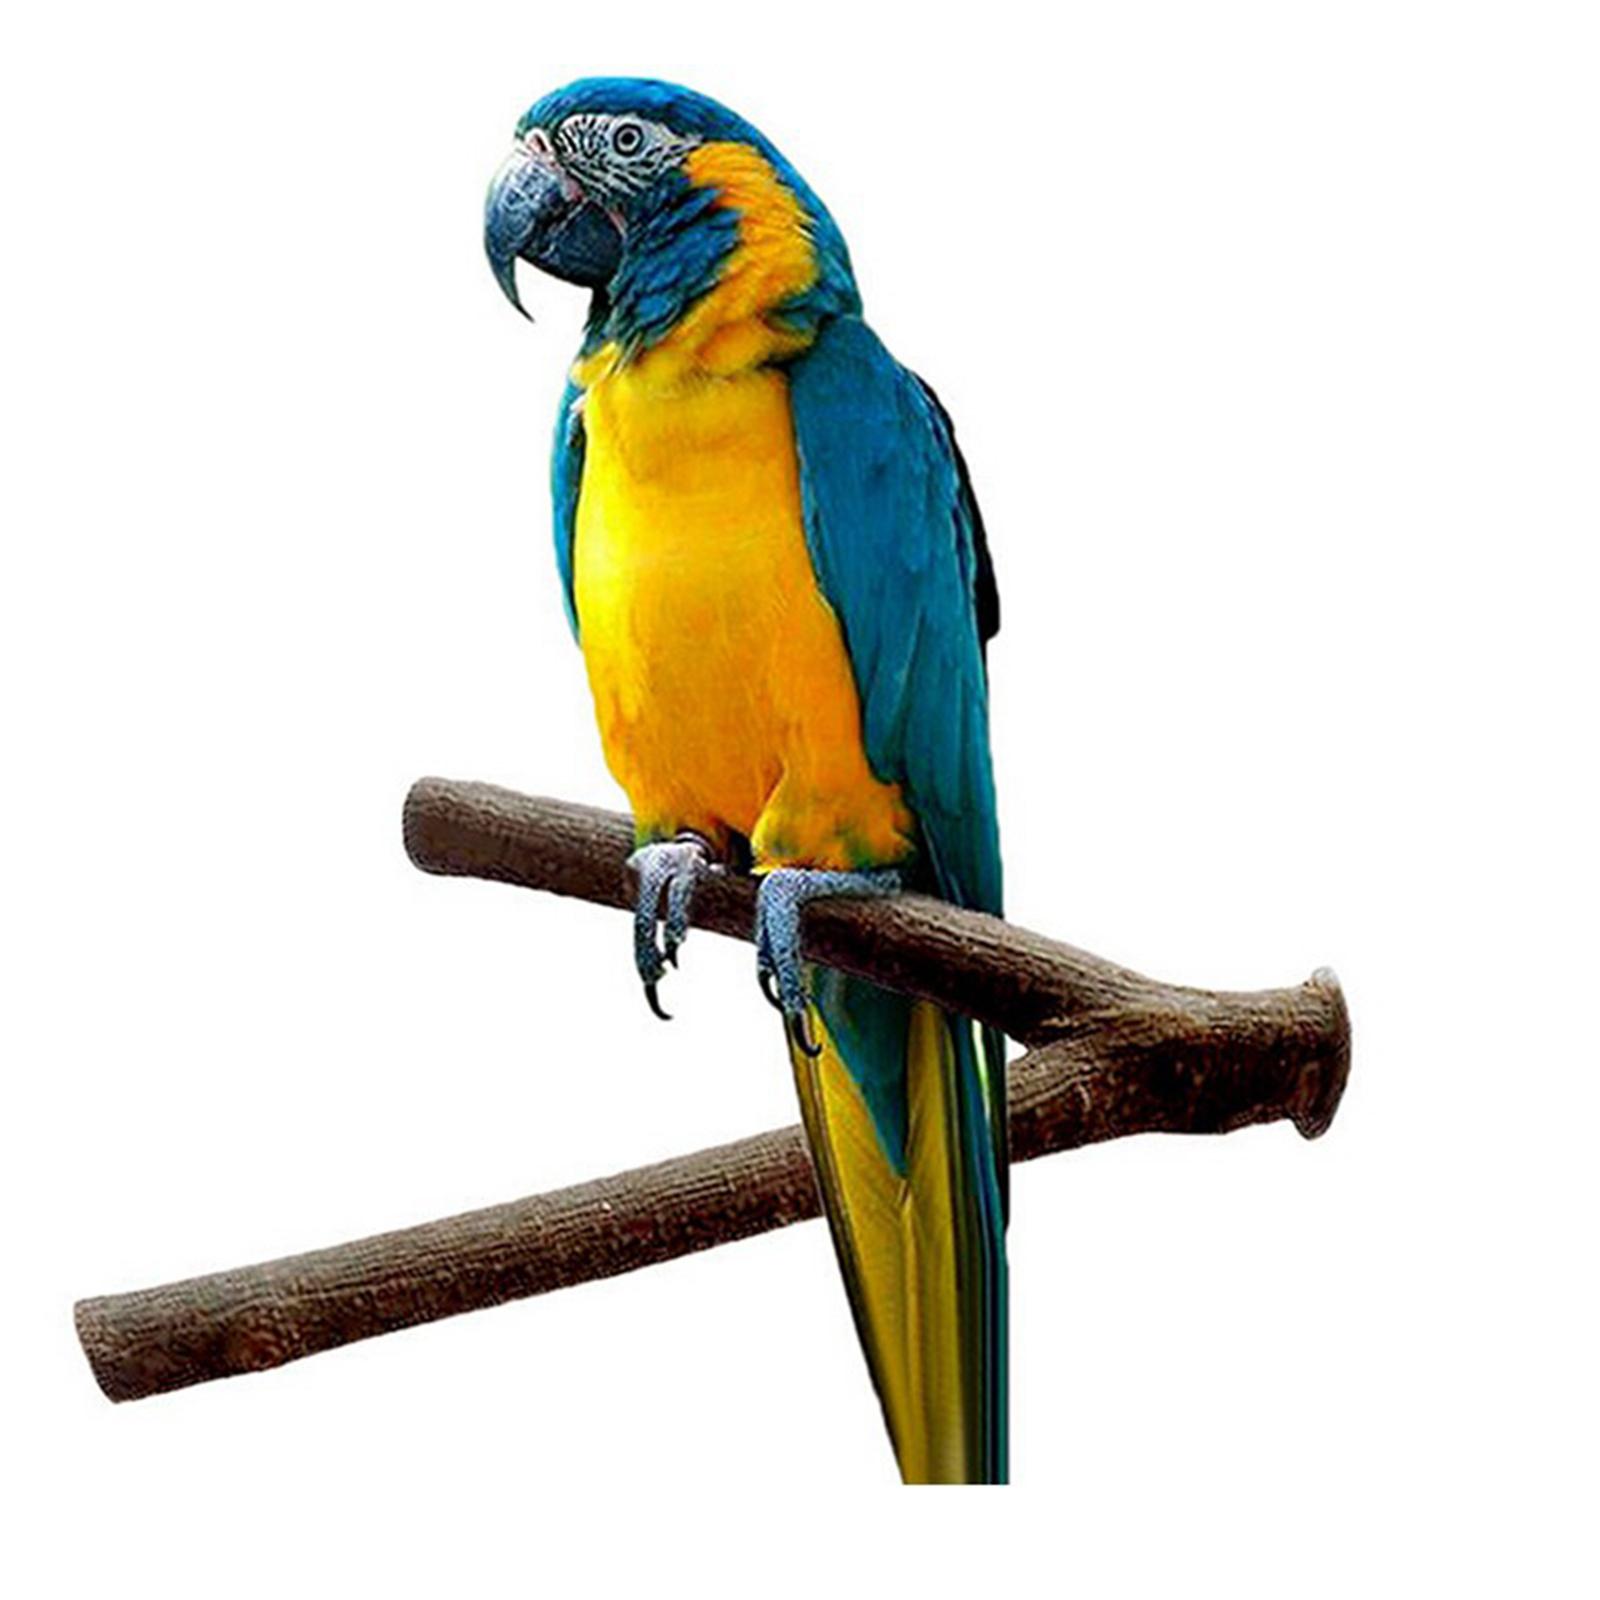 thumbnail 5 - Bird-Perch-Wood-Stand-Bird-Cage-Swing-Branch-for-Parrot-Parakeet-Cockatiel